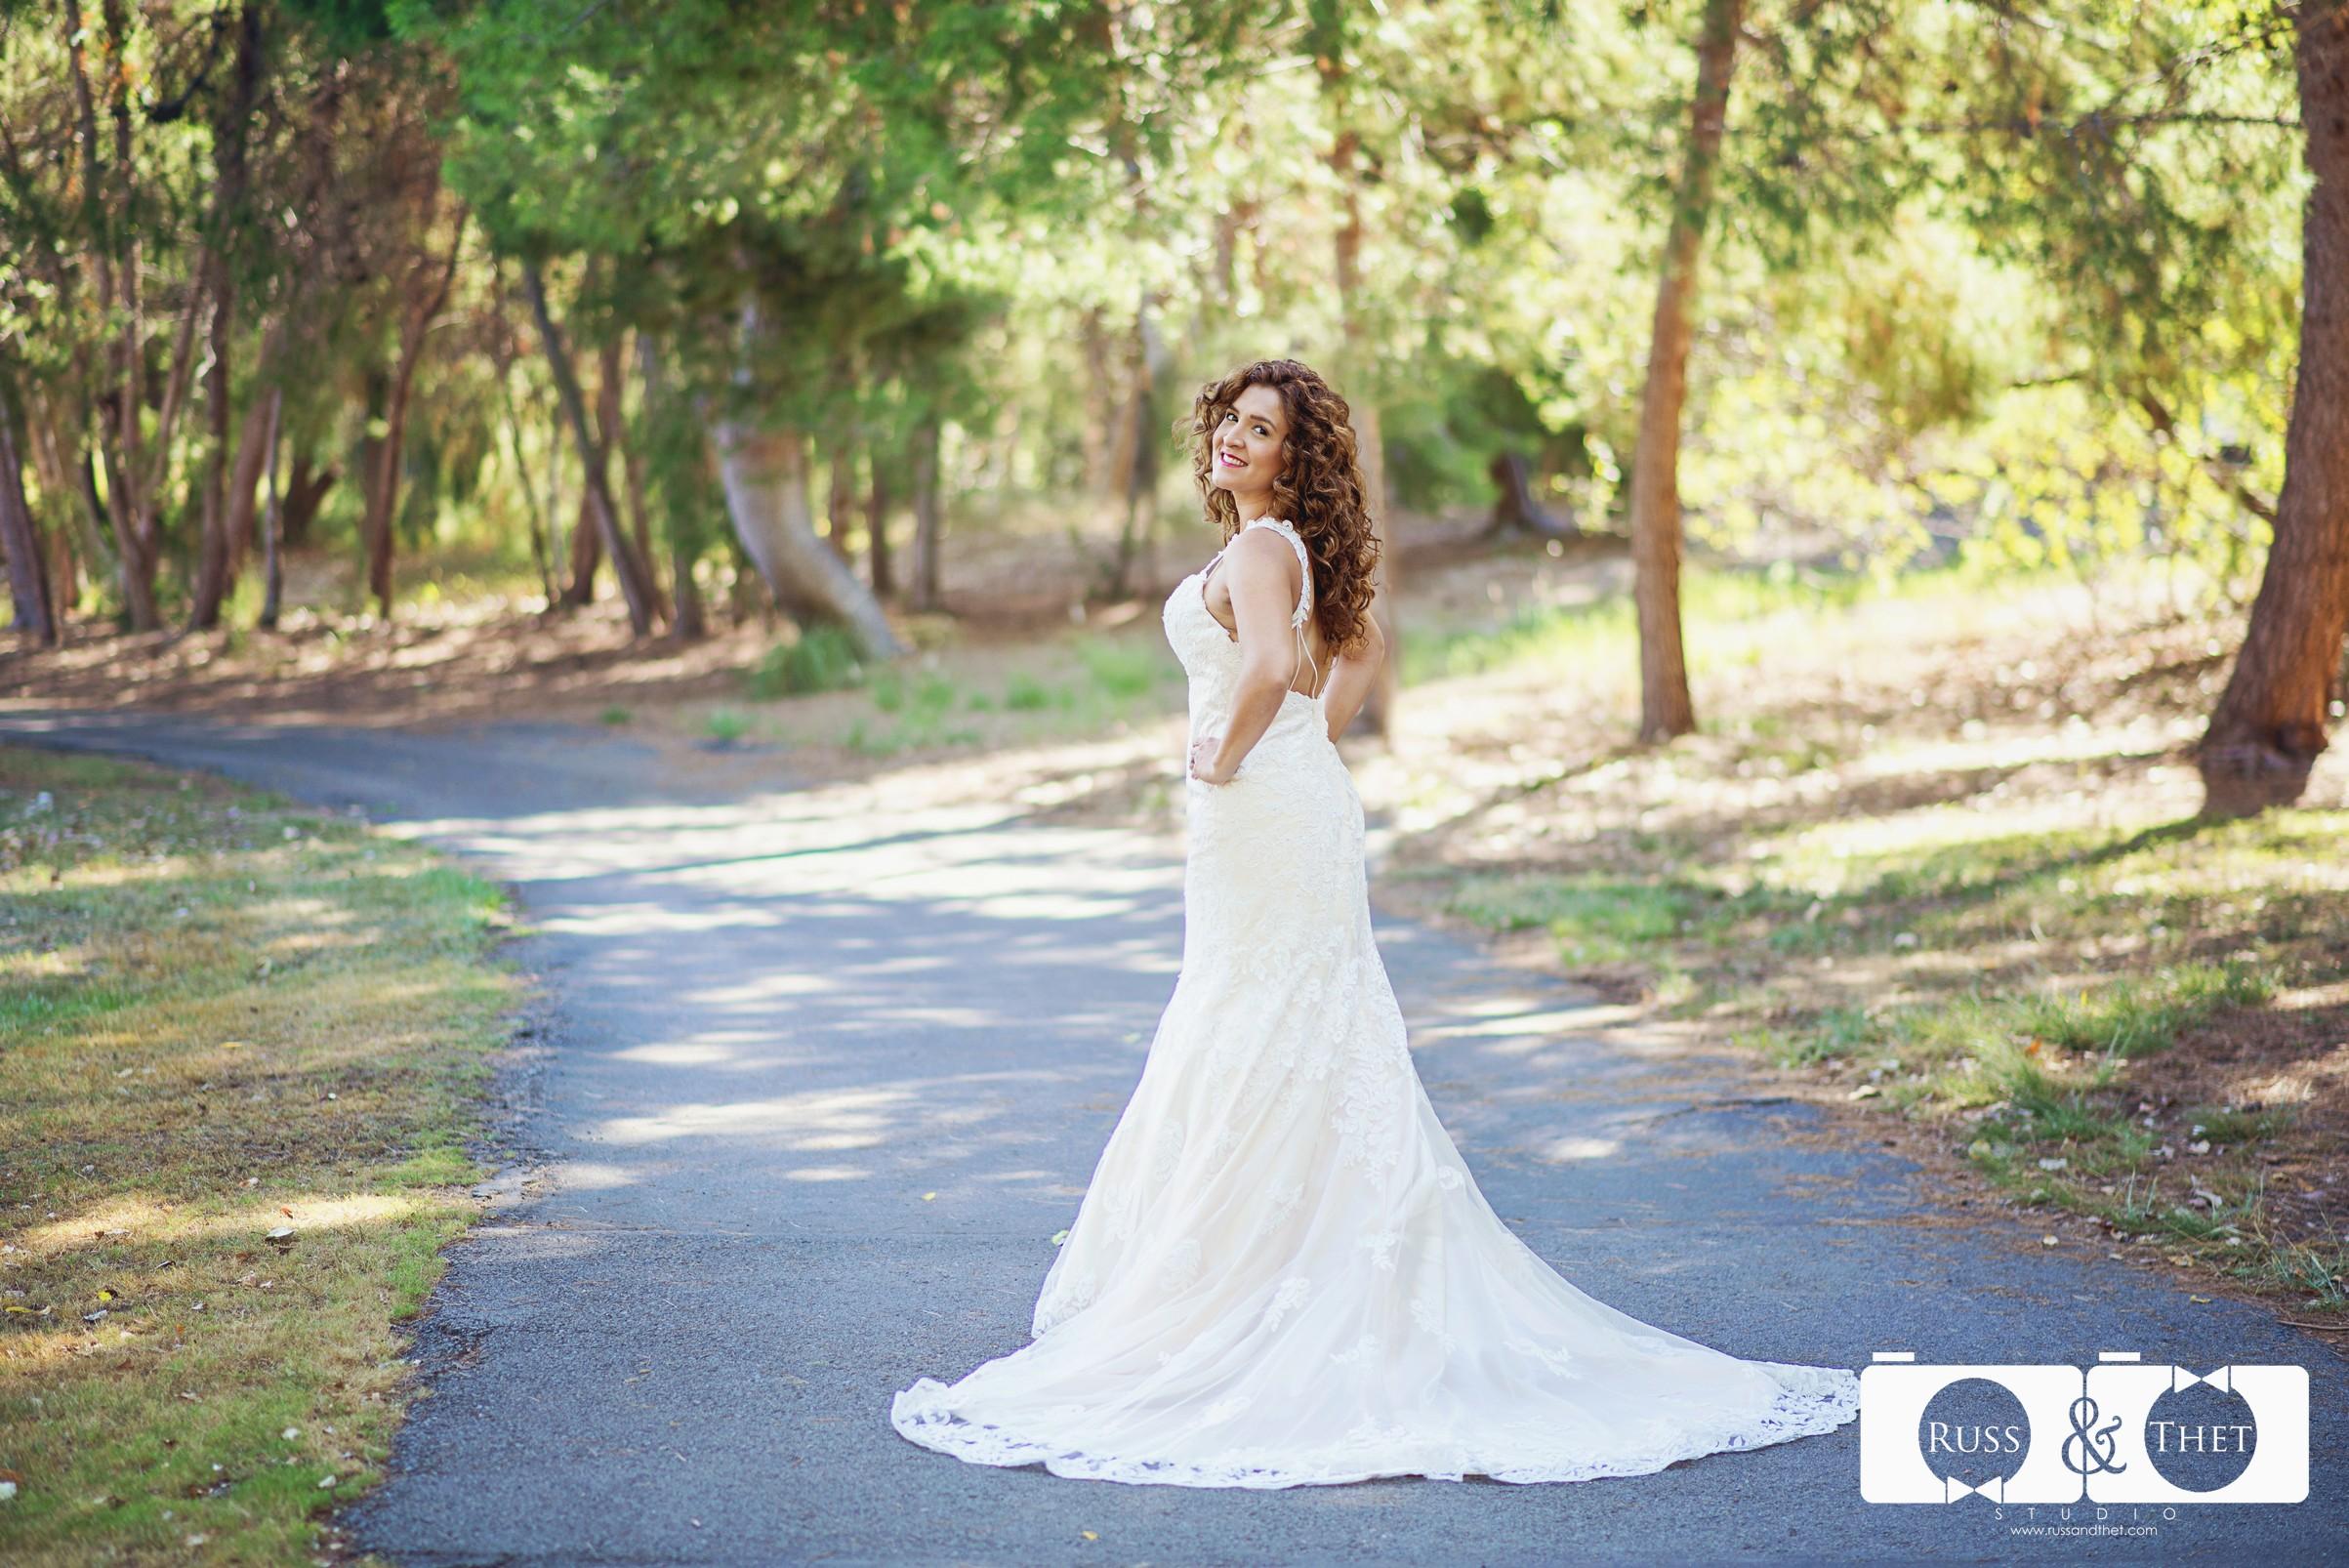 Andrew-and-Cristina-Yorba-Park-Wedding-Photographers (6).jpg